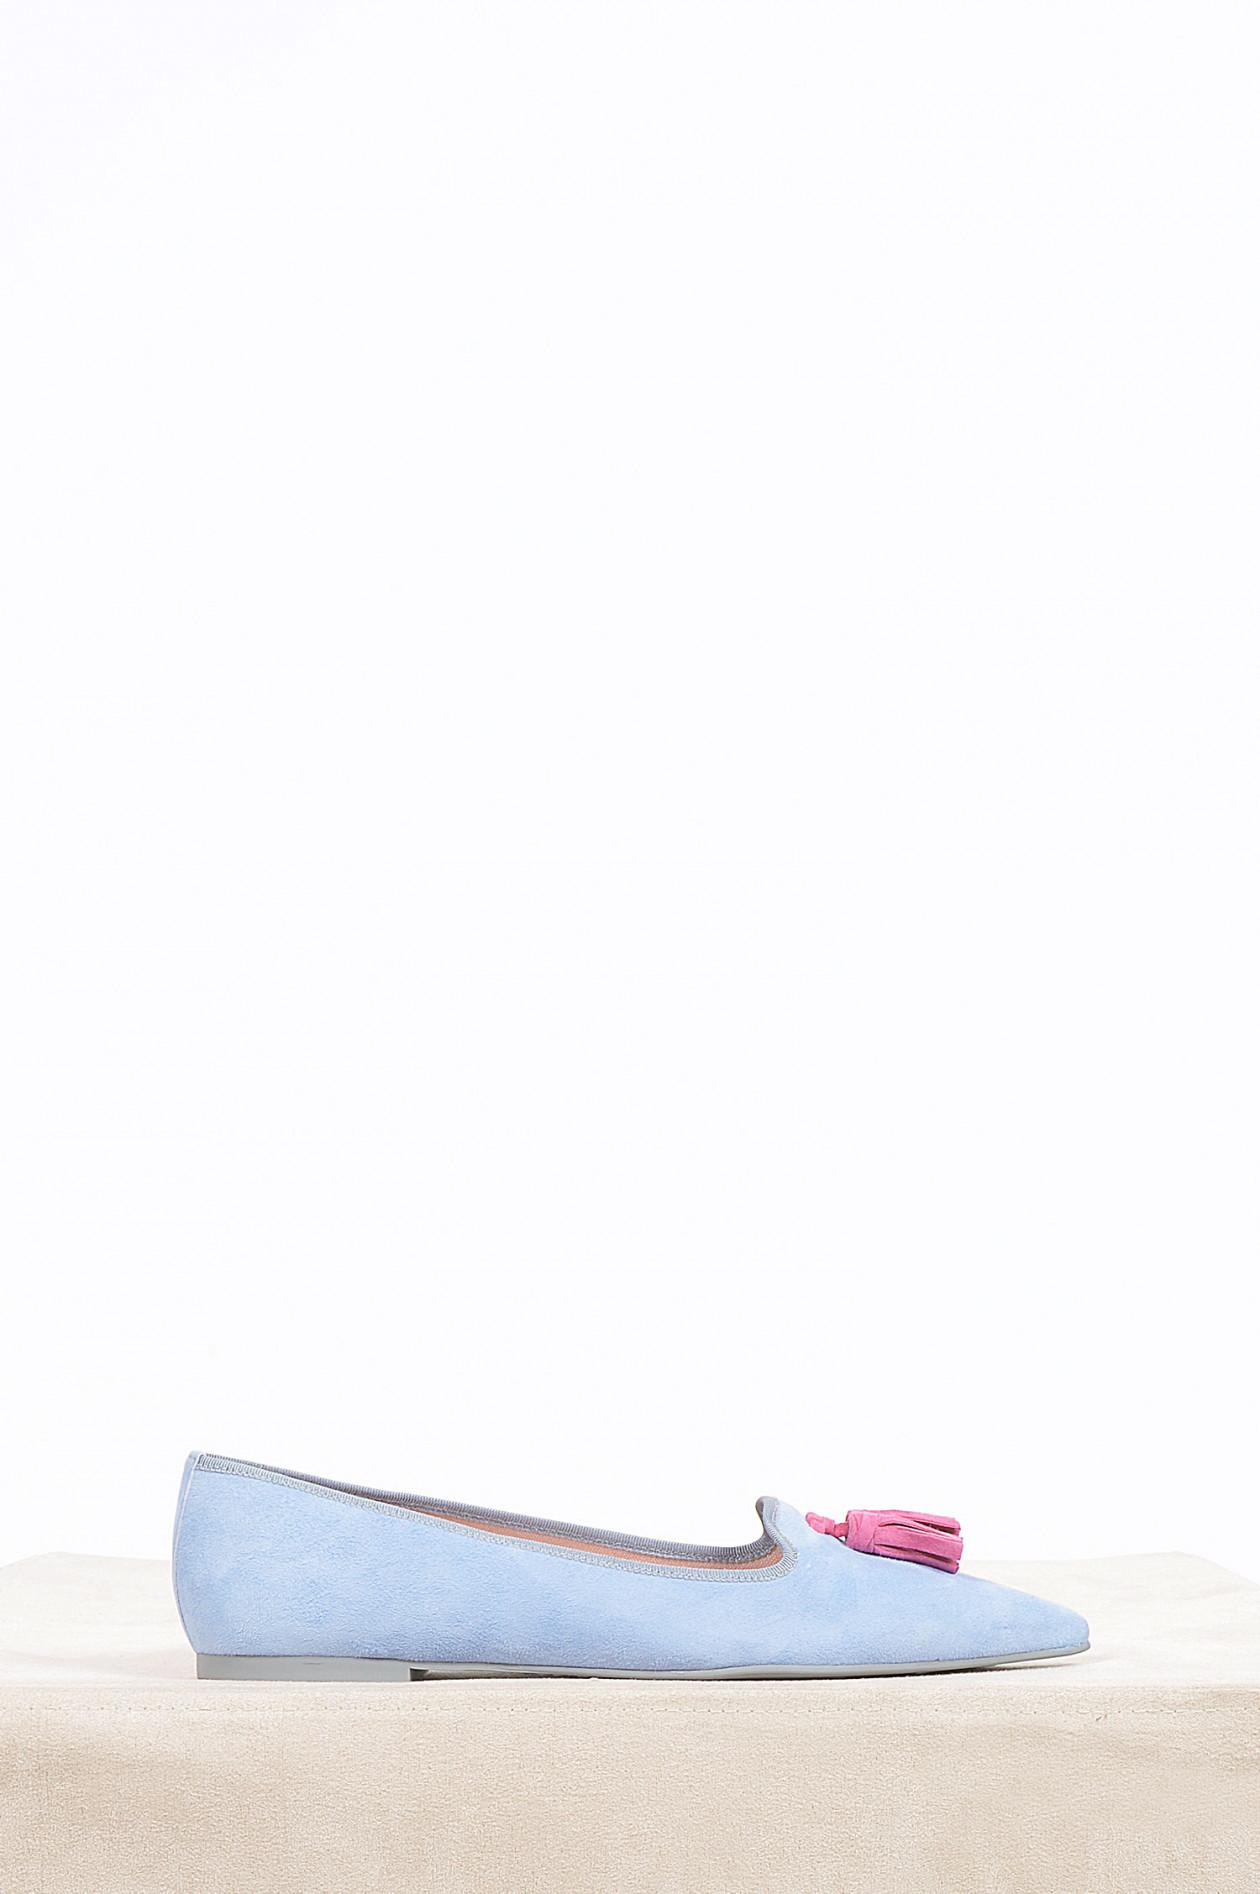 super popular 11e23 4cf07 Loafers mit Tassel in Hellblau/Pink